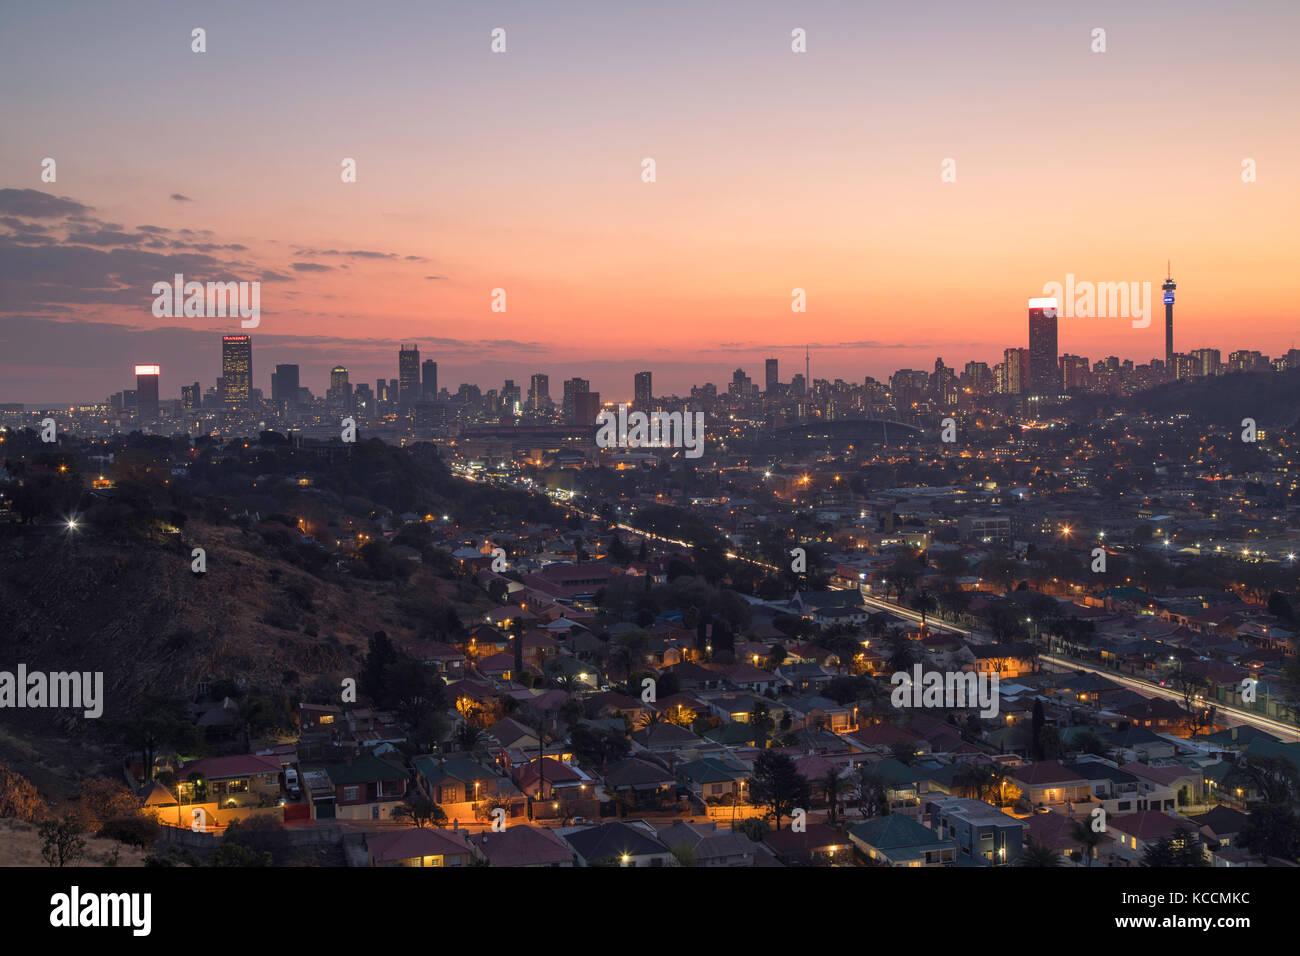 View of skyline at sunset, Johannesburg, Gauteng, South Africa - Stock Image